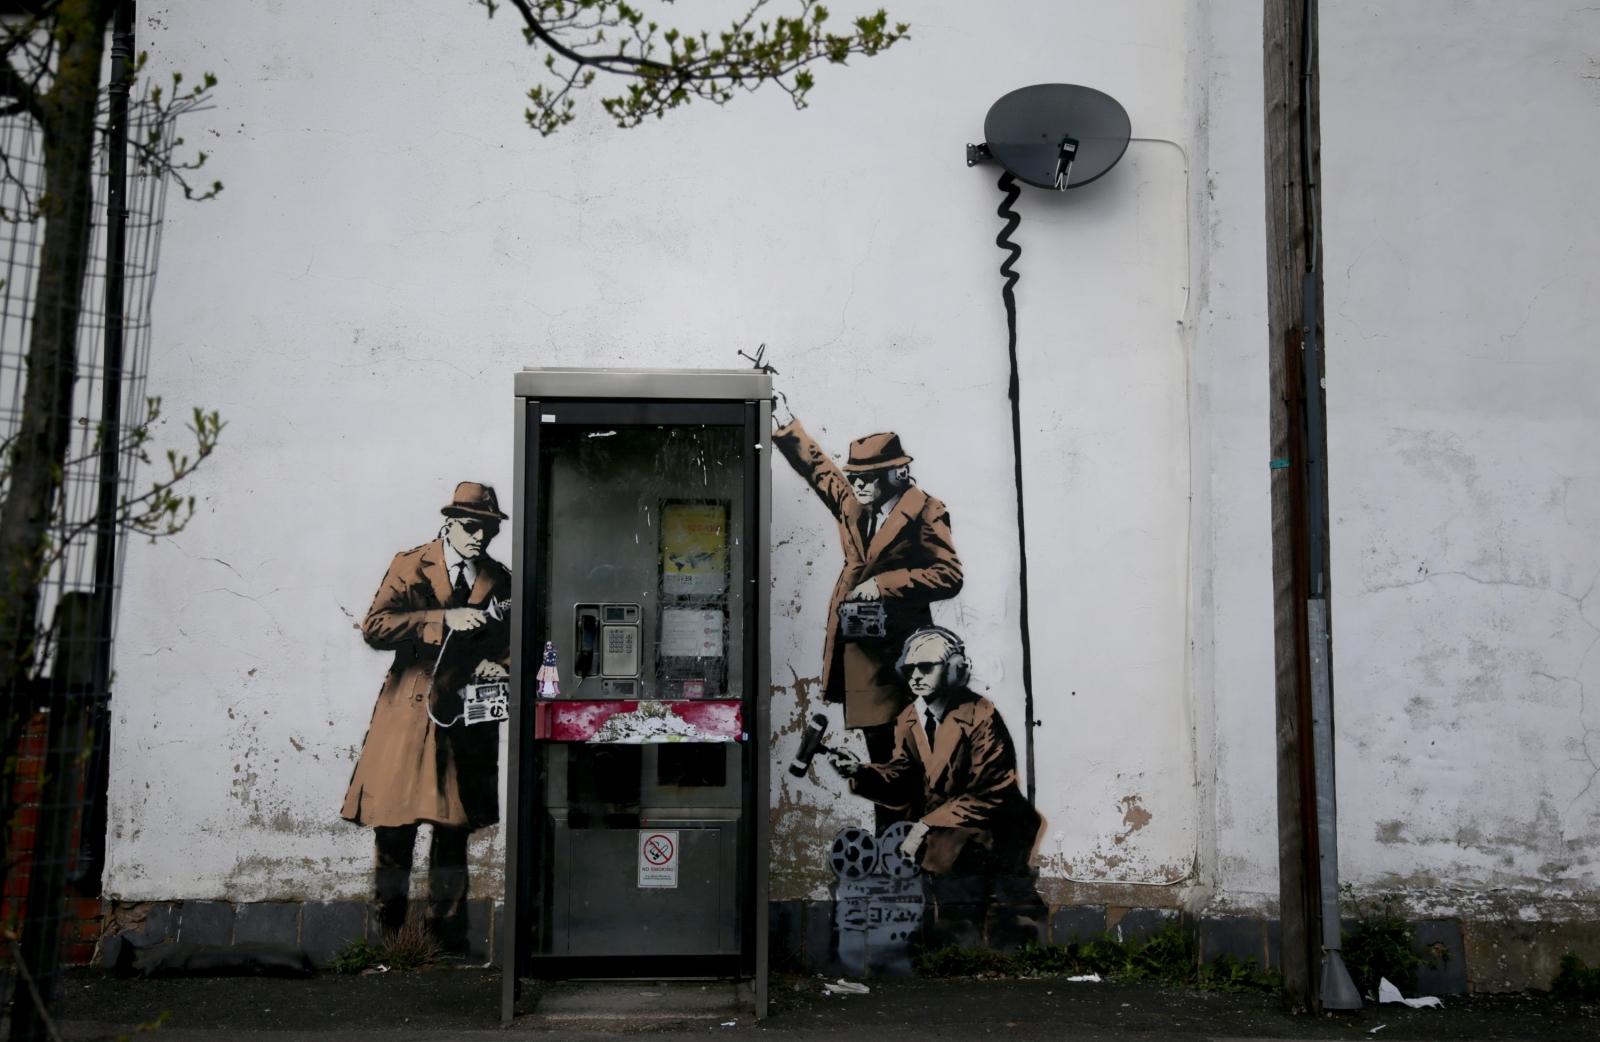 Banksy mural near GCHQ depicts spying